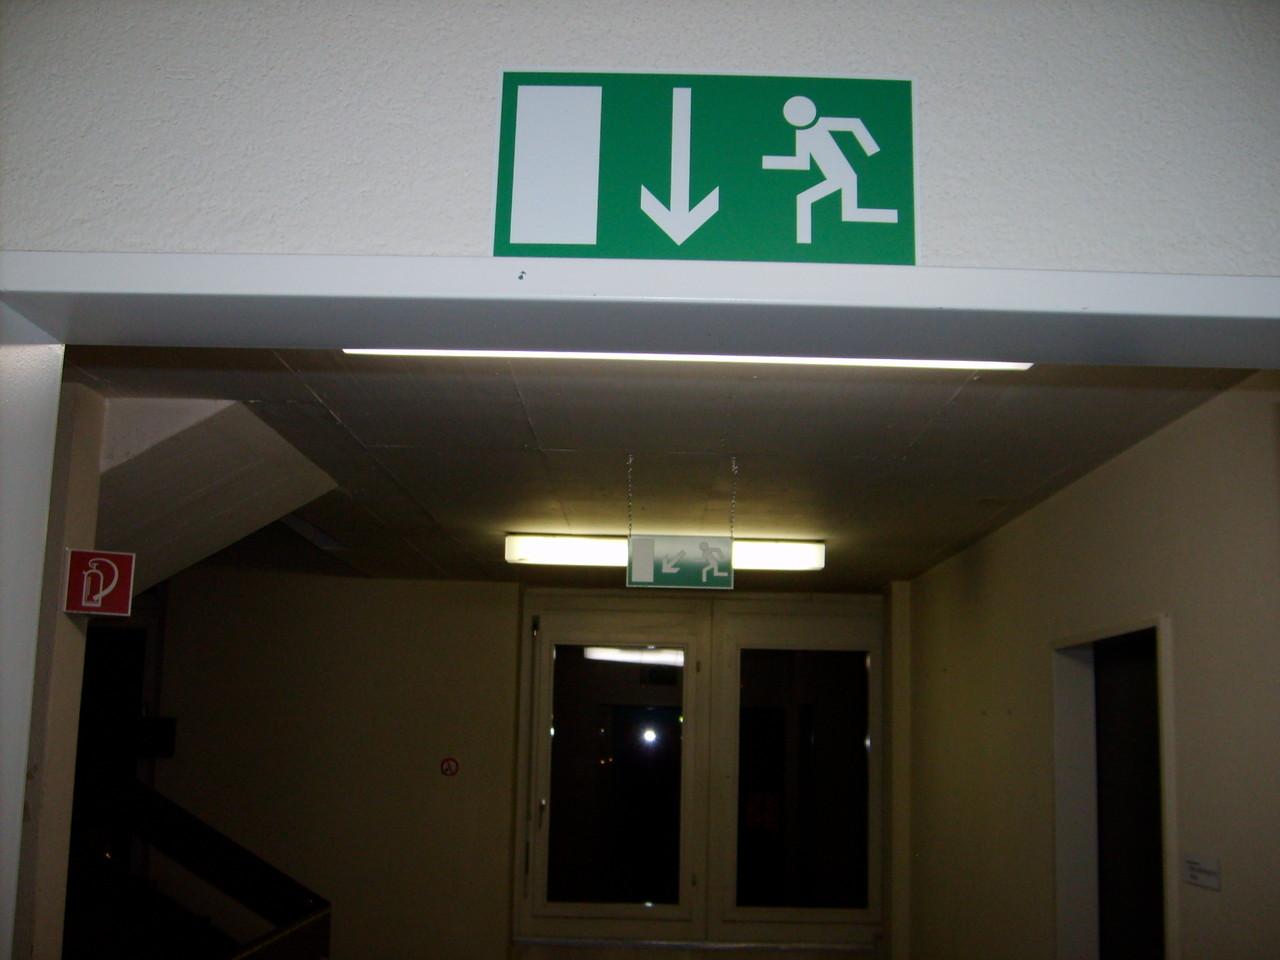 Fluchtweg - geradeaus/links nach unten